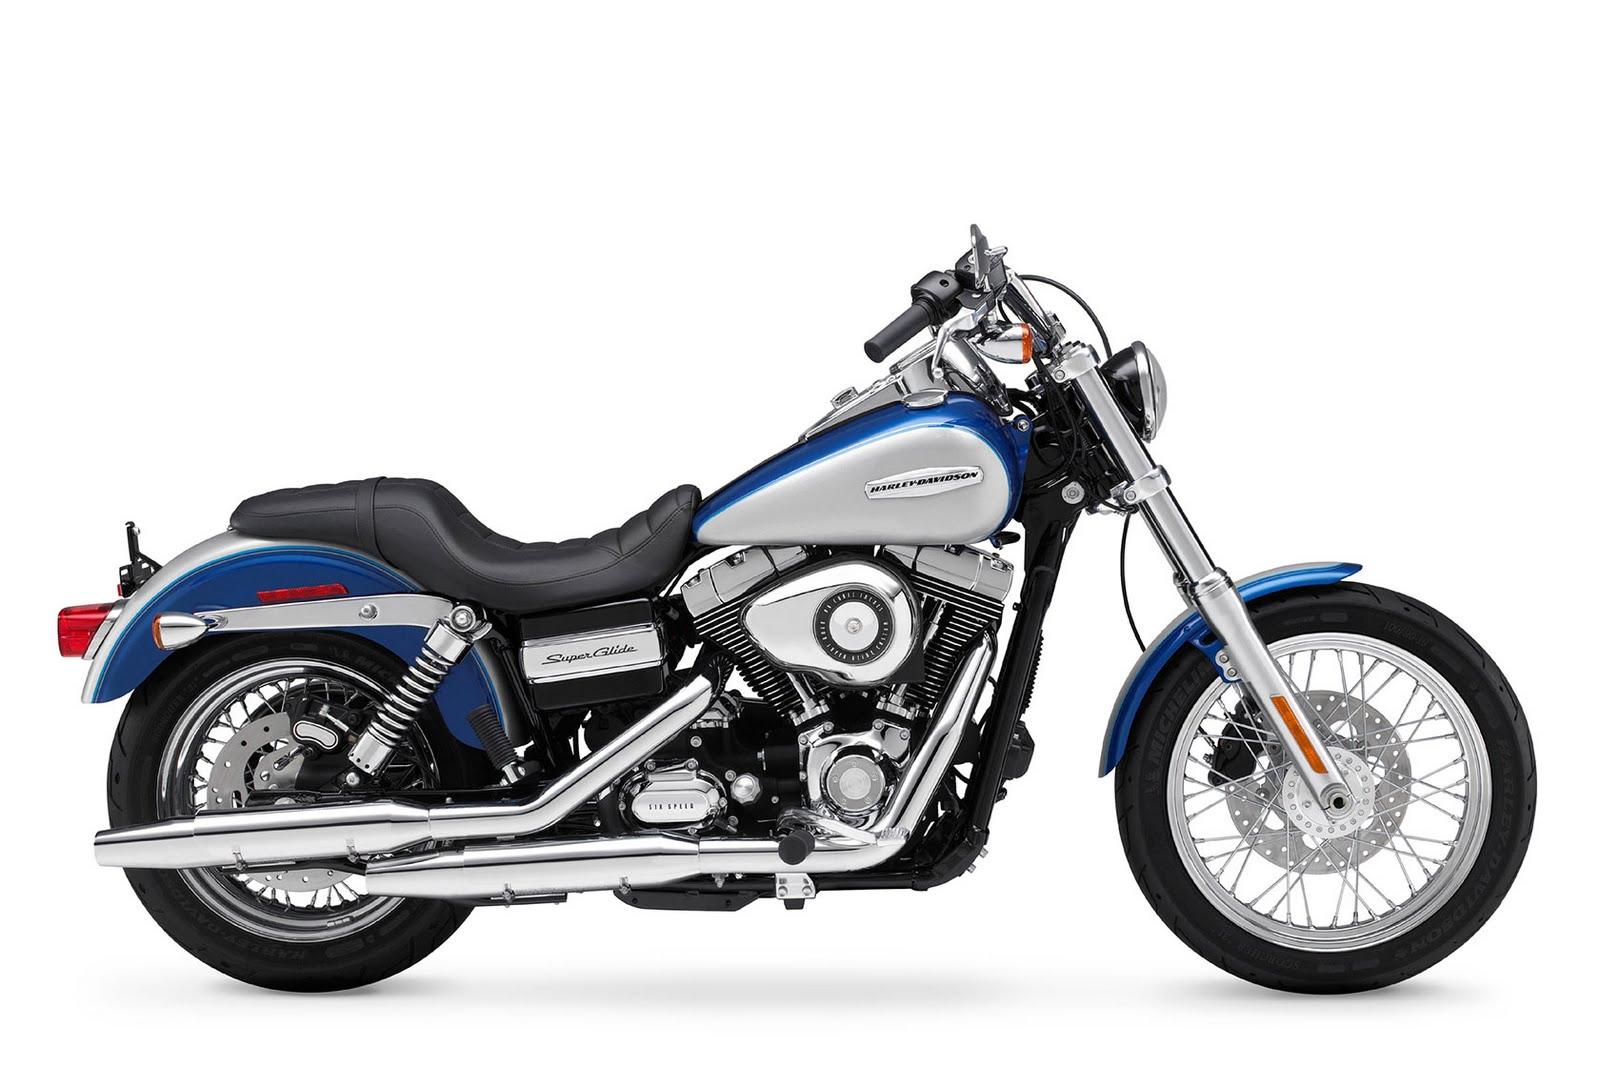 Harley Davidson Type Dyna Super Glide Custom FXDC